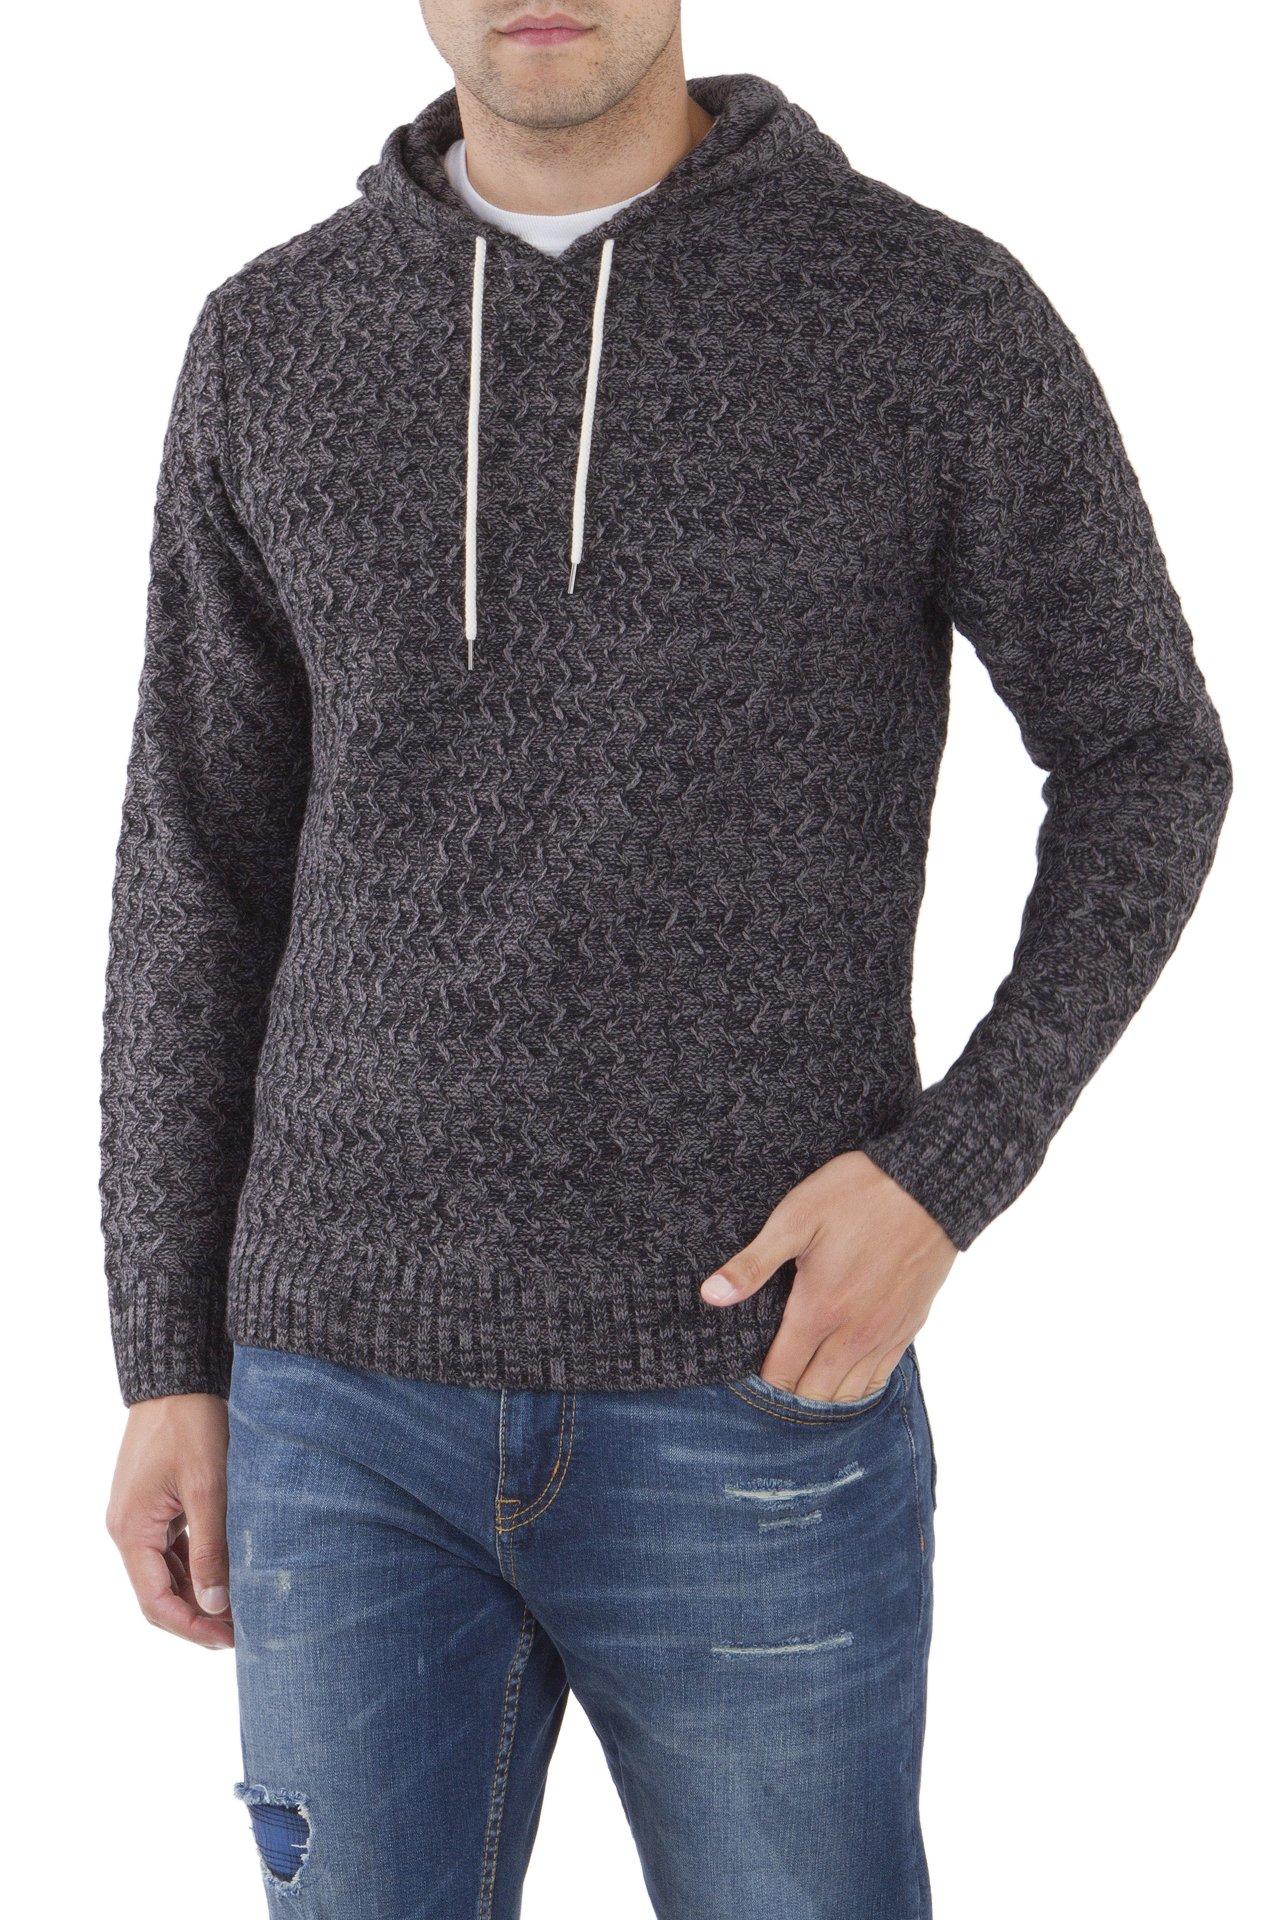 UNIONBAY Men's Drawcord Sweater